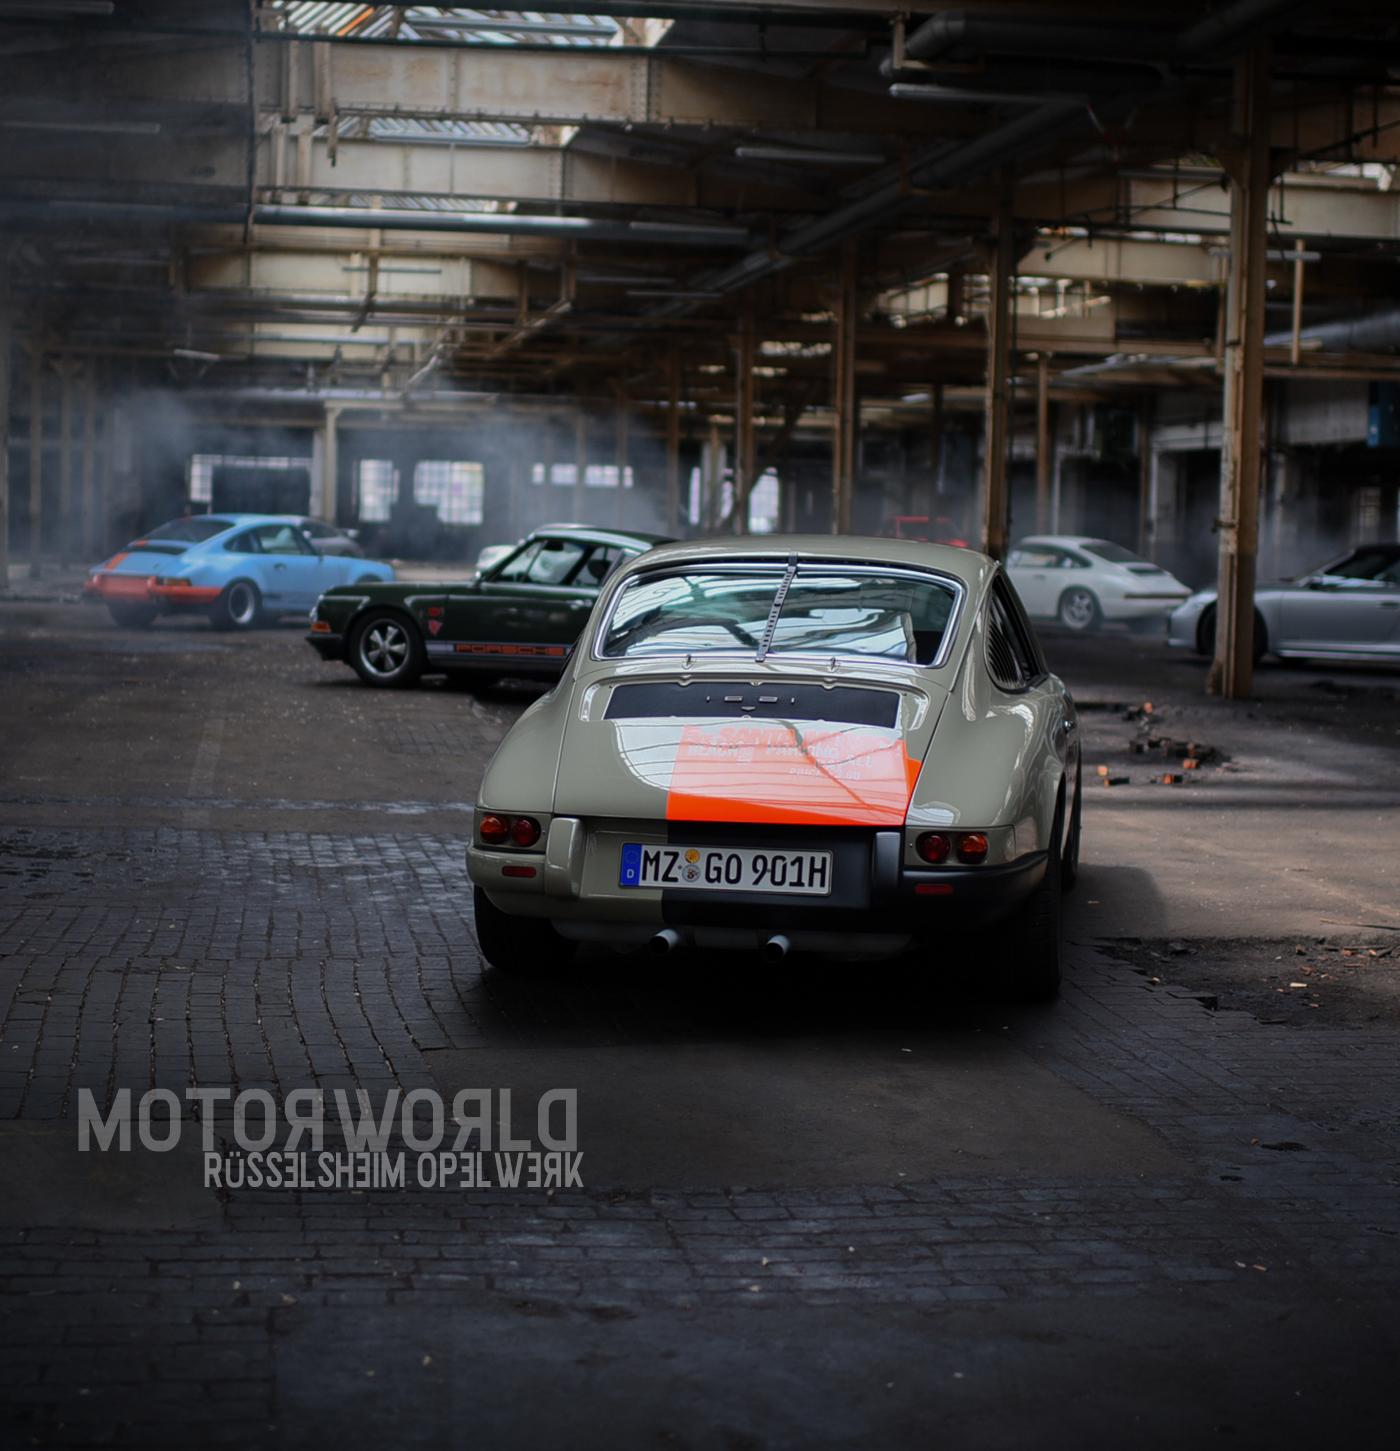 Motorworld_title2